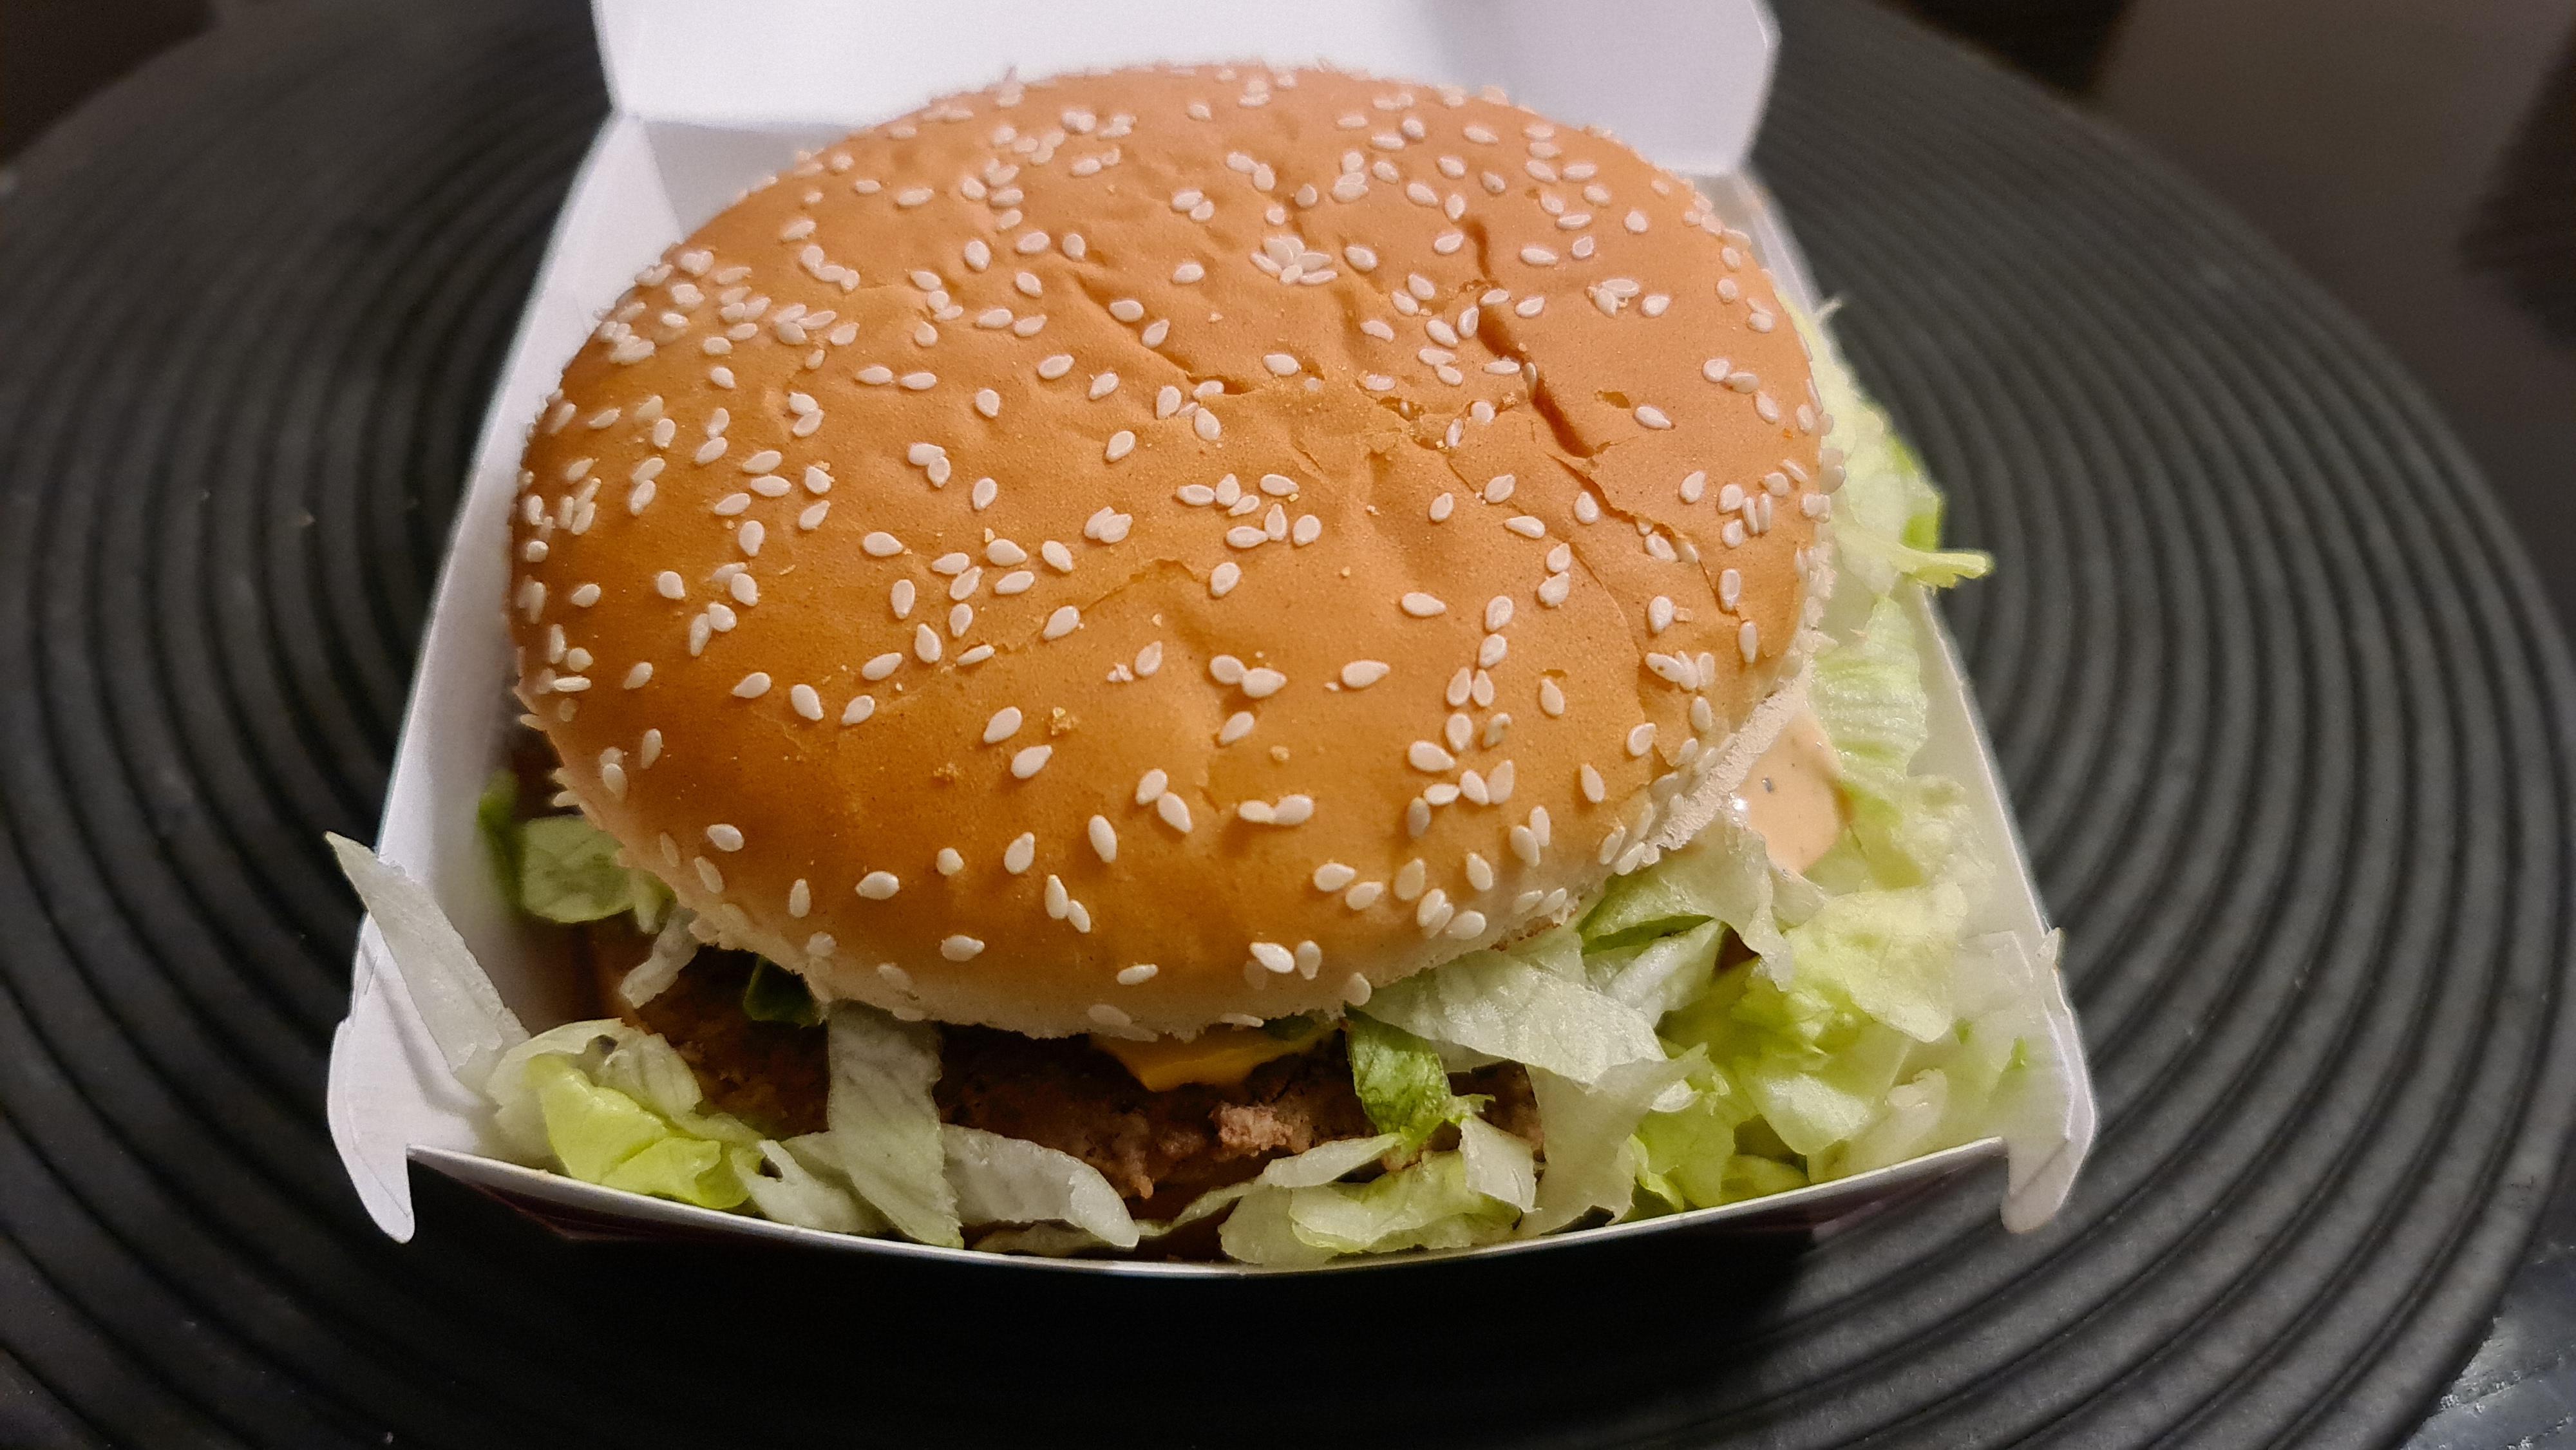 https://foodloader.net/Holz_2021-01-09_McDonalds.jpg